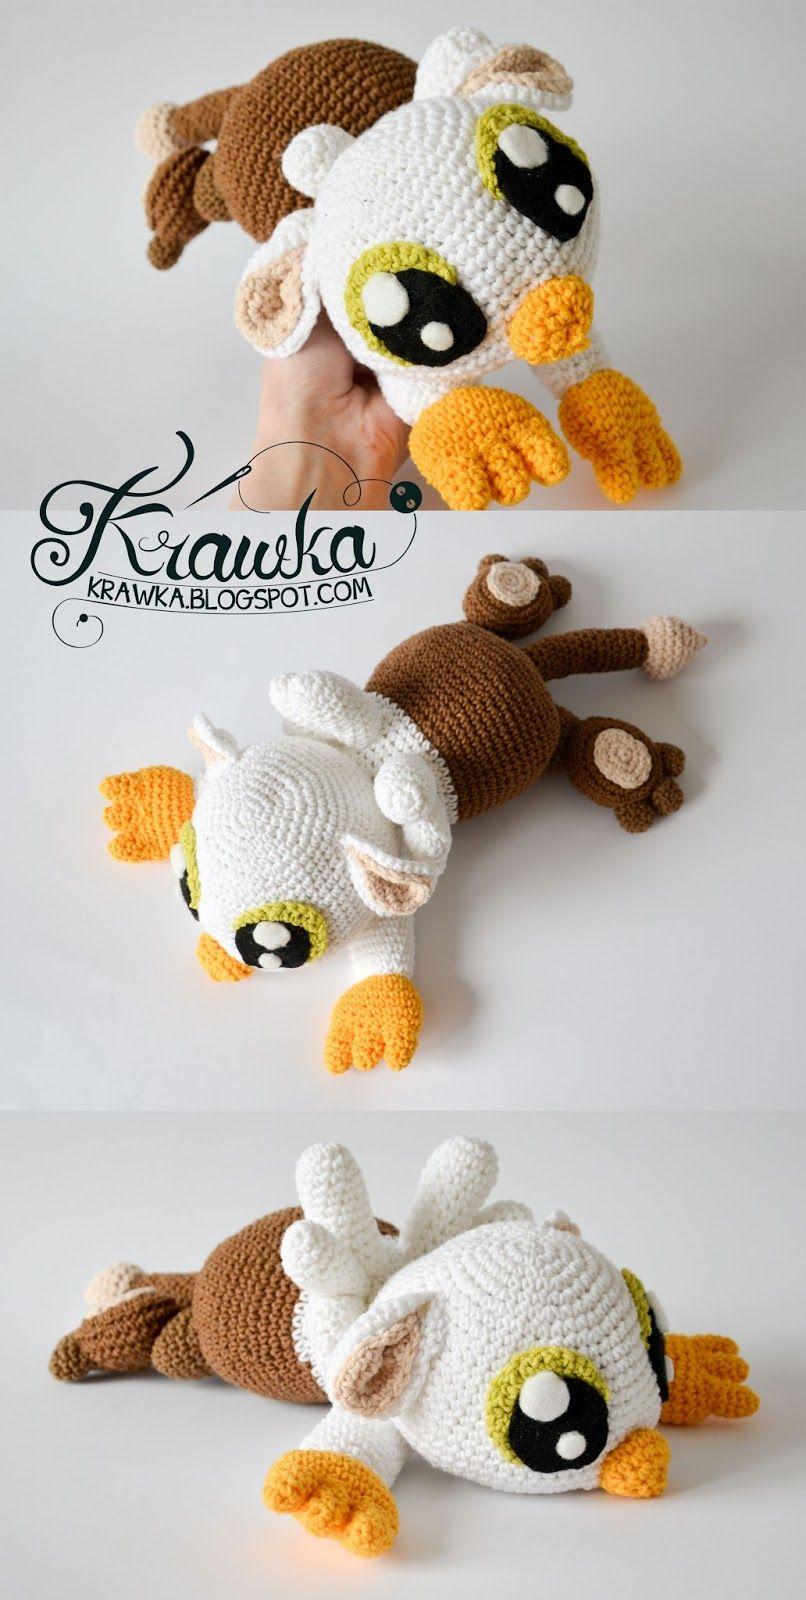 Krawka: Baby griffin gryphon crochet pattern by Krawka mythological ...